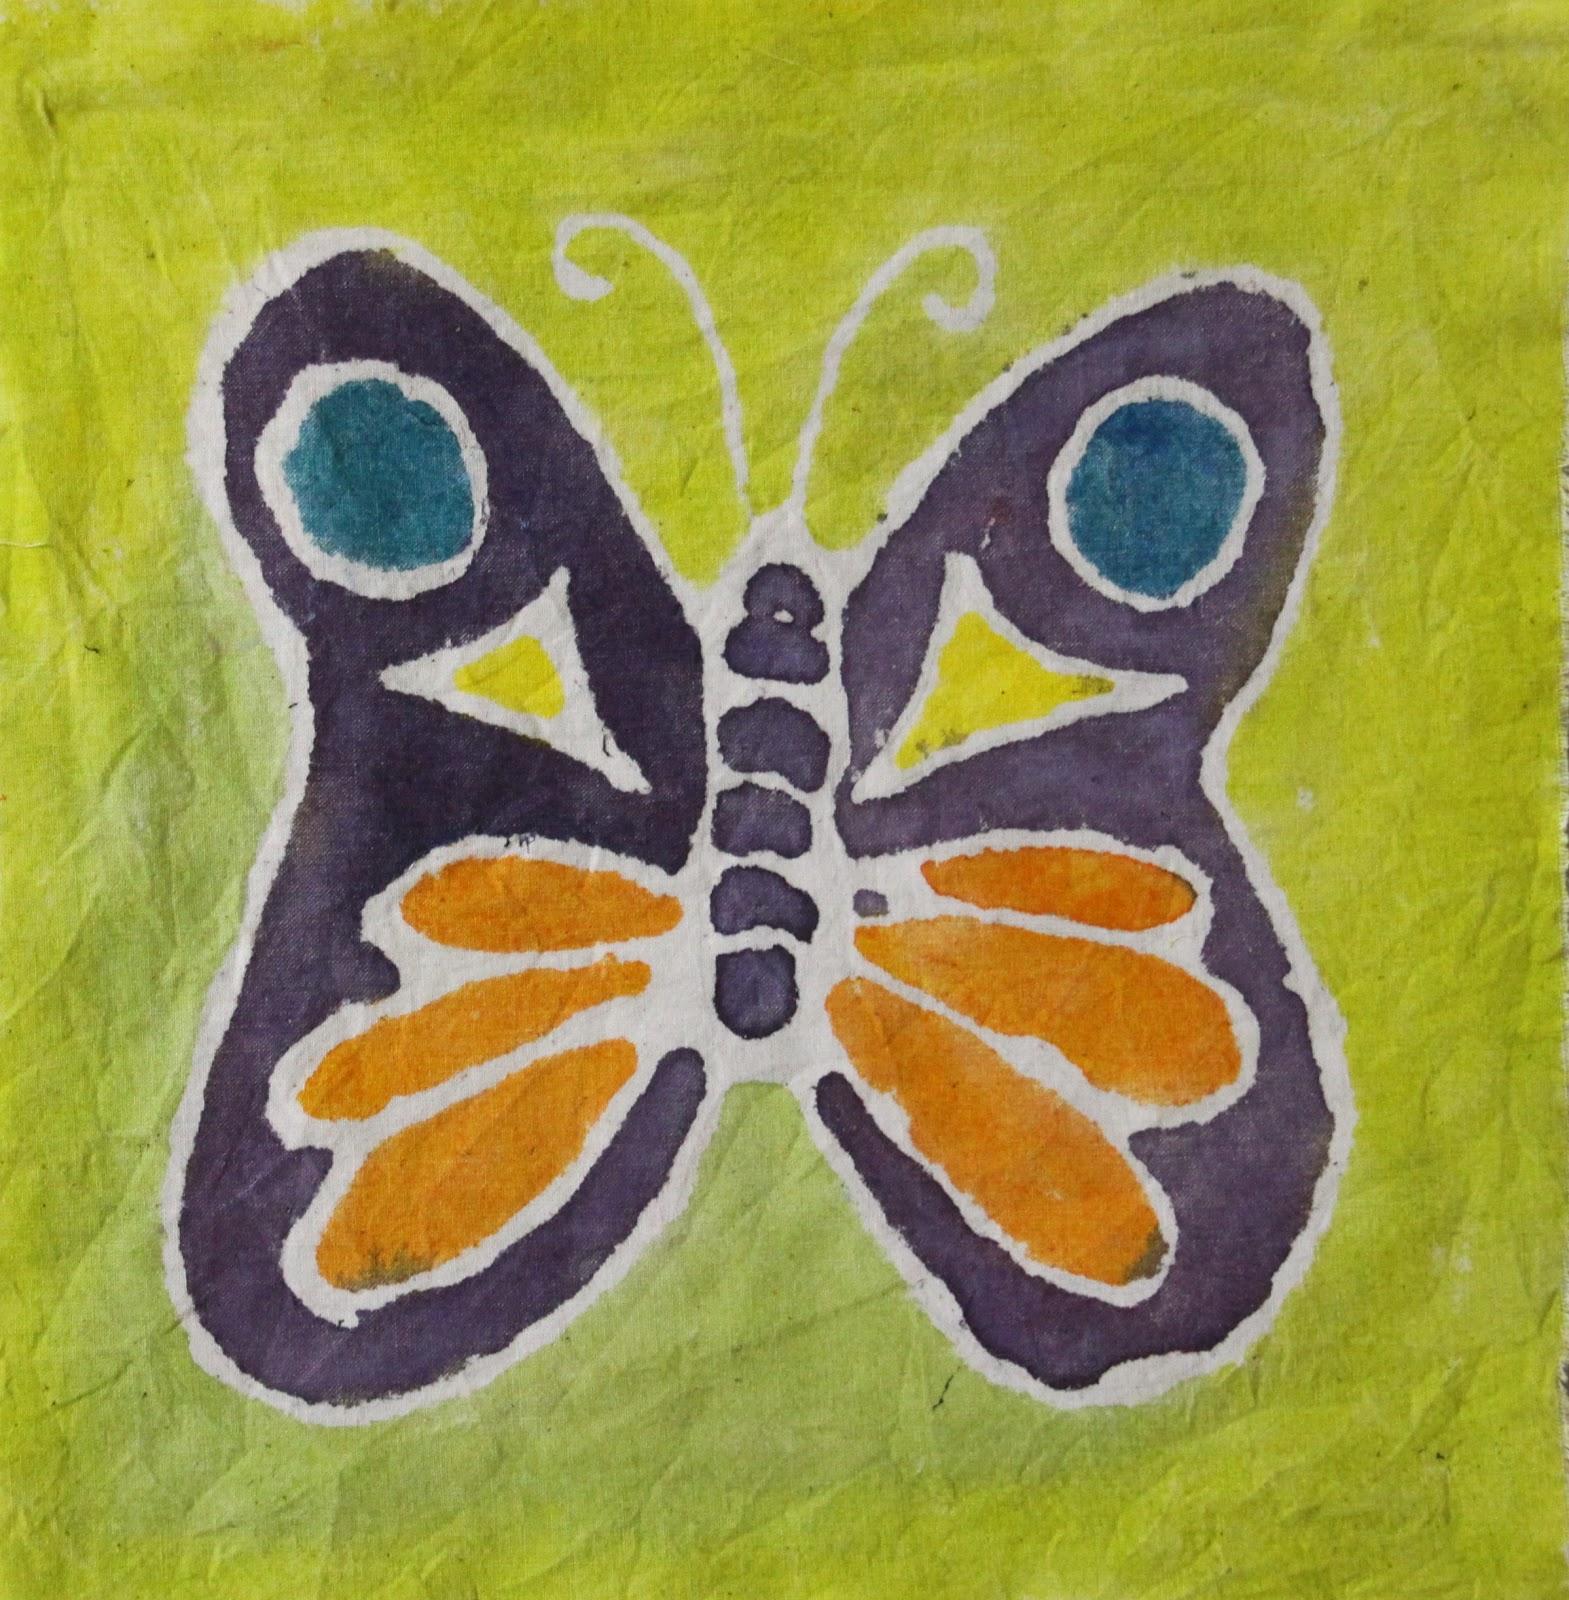 Arty Crafty Studio: Batik Painting For Kids